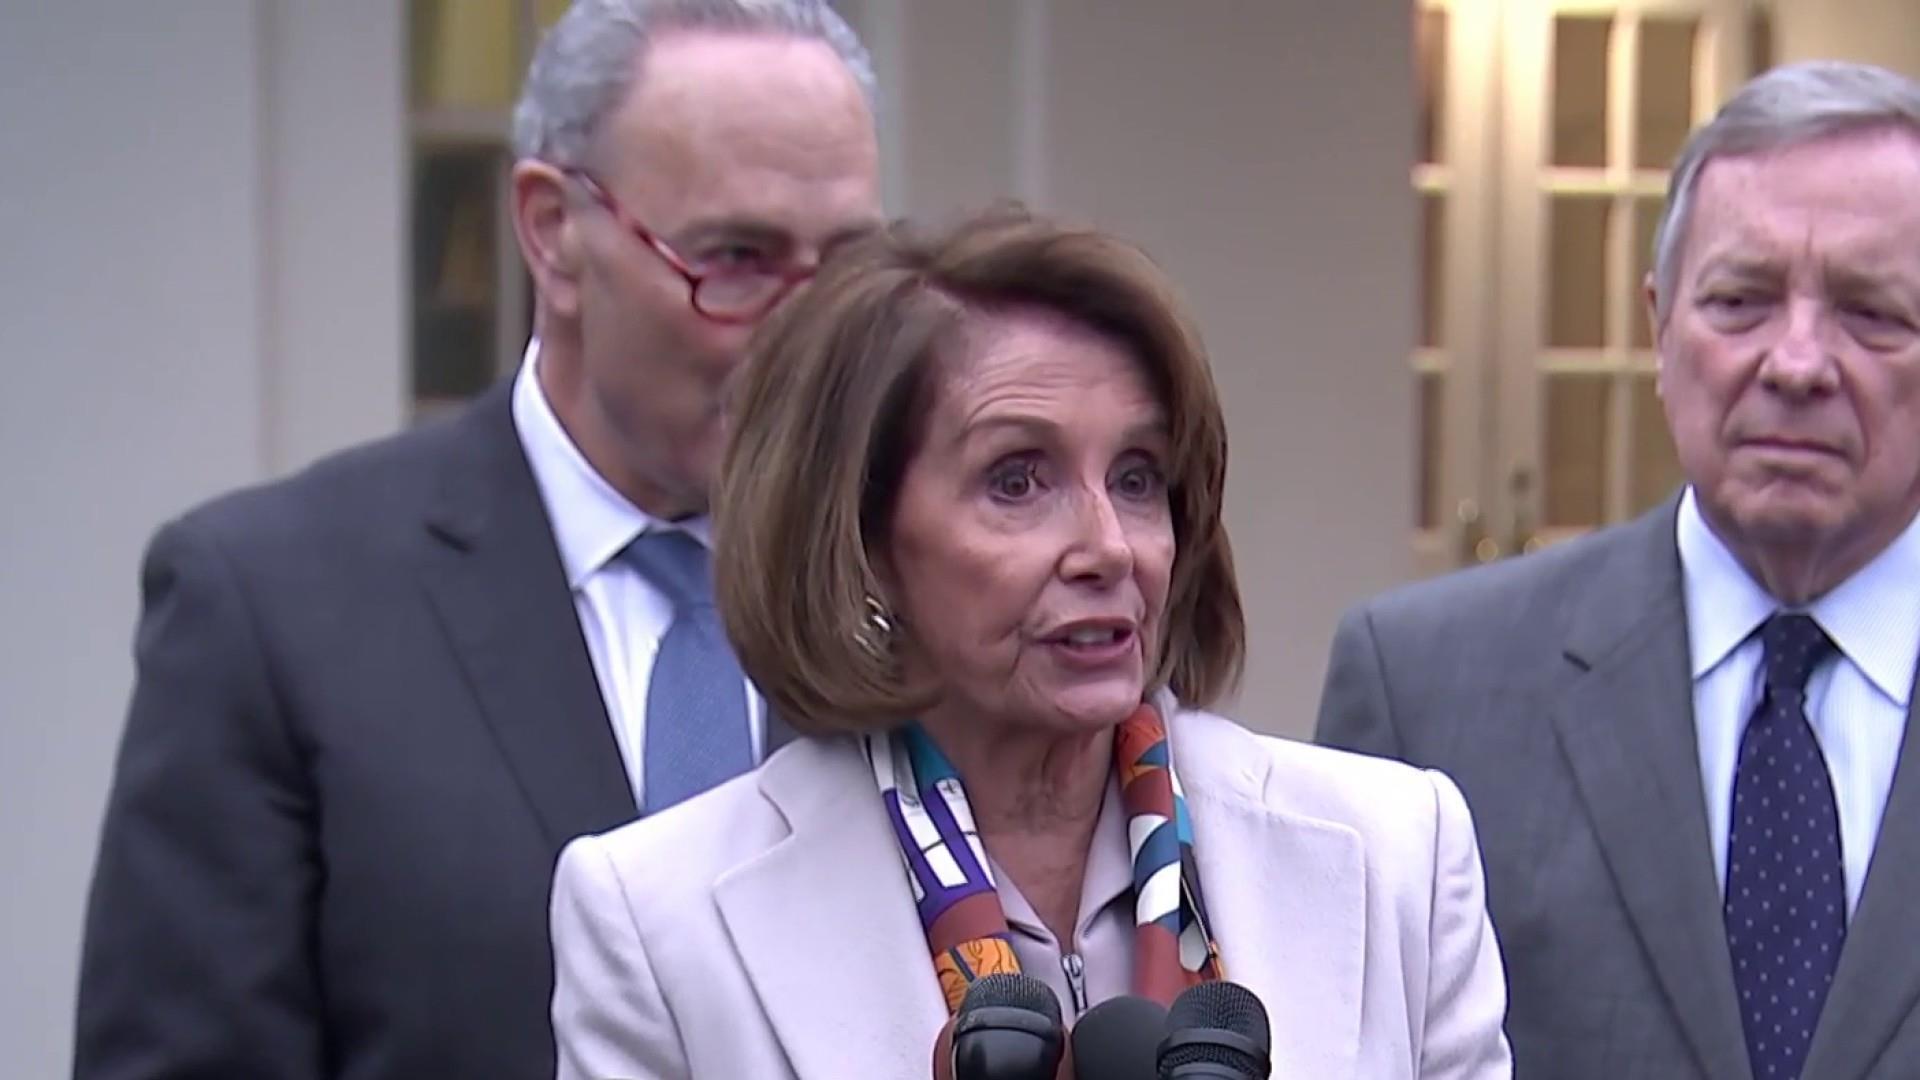 Rattled Trump braces for Nancy Pelosi era